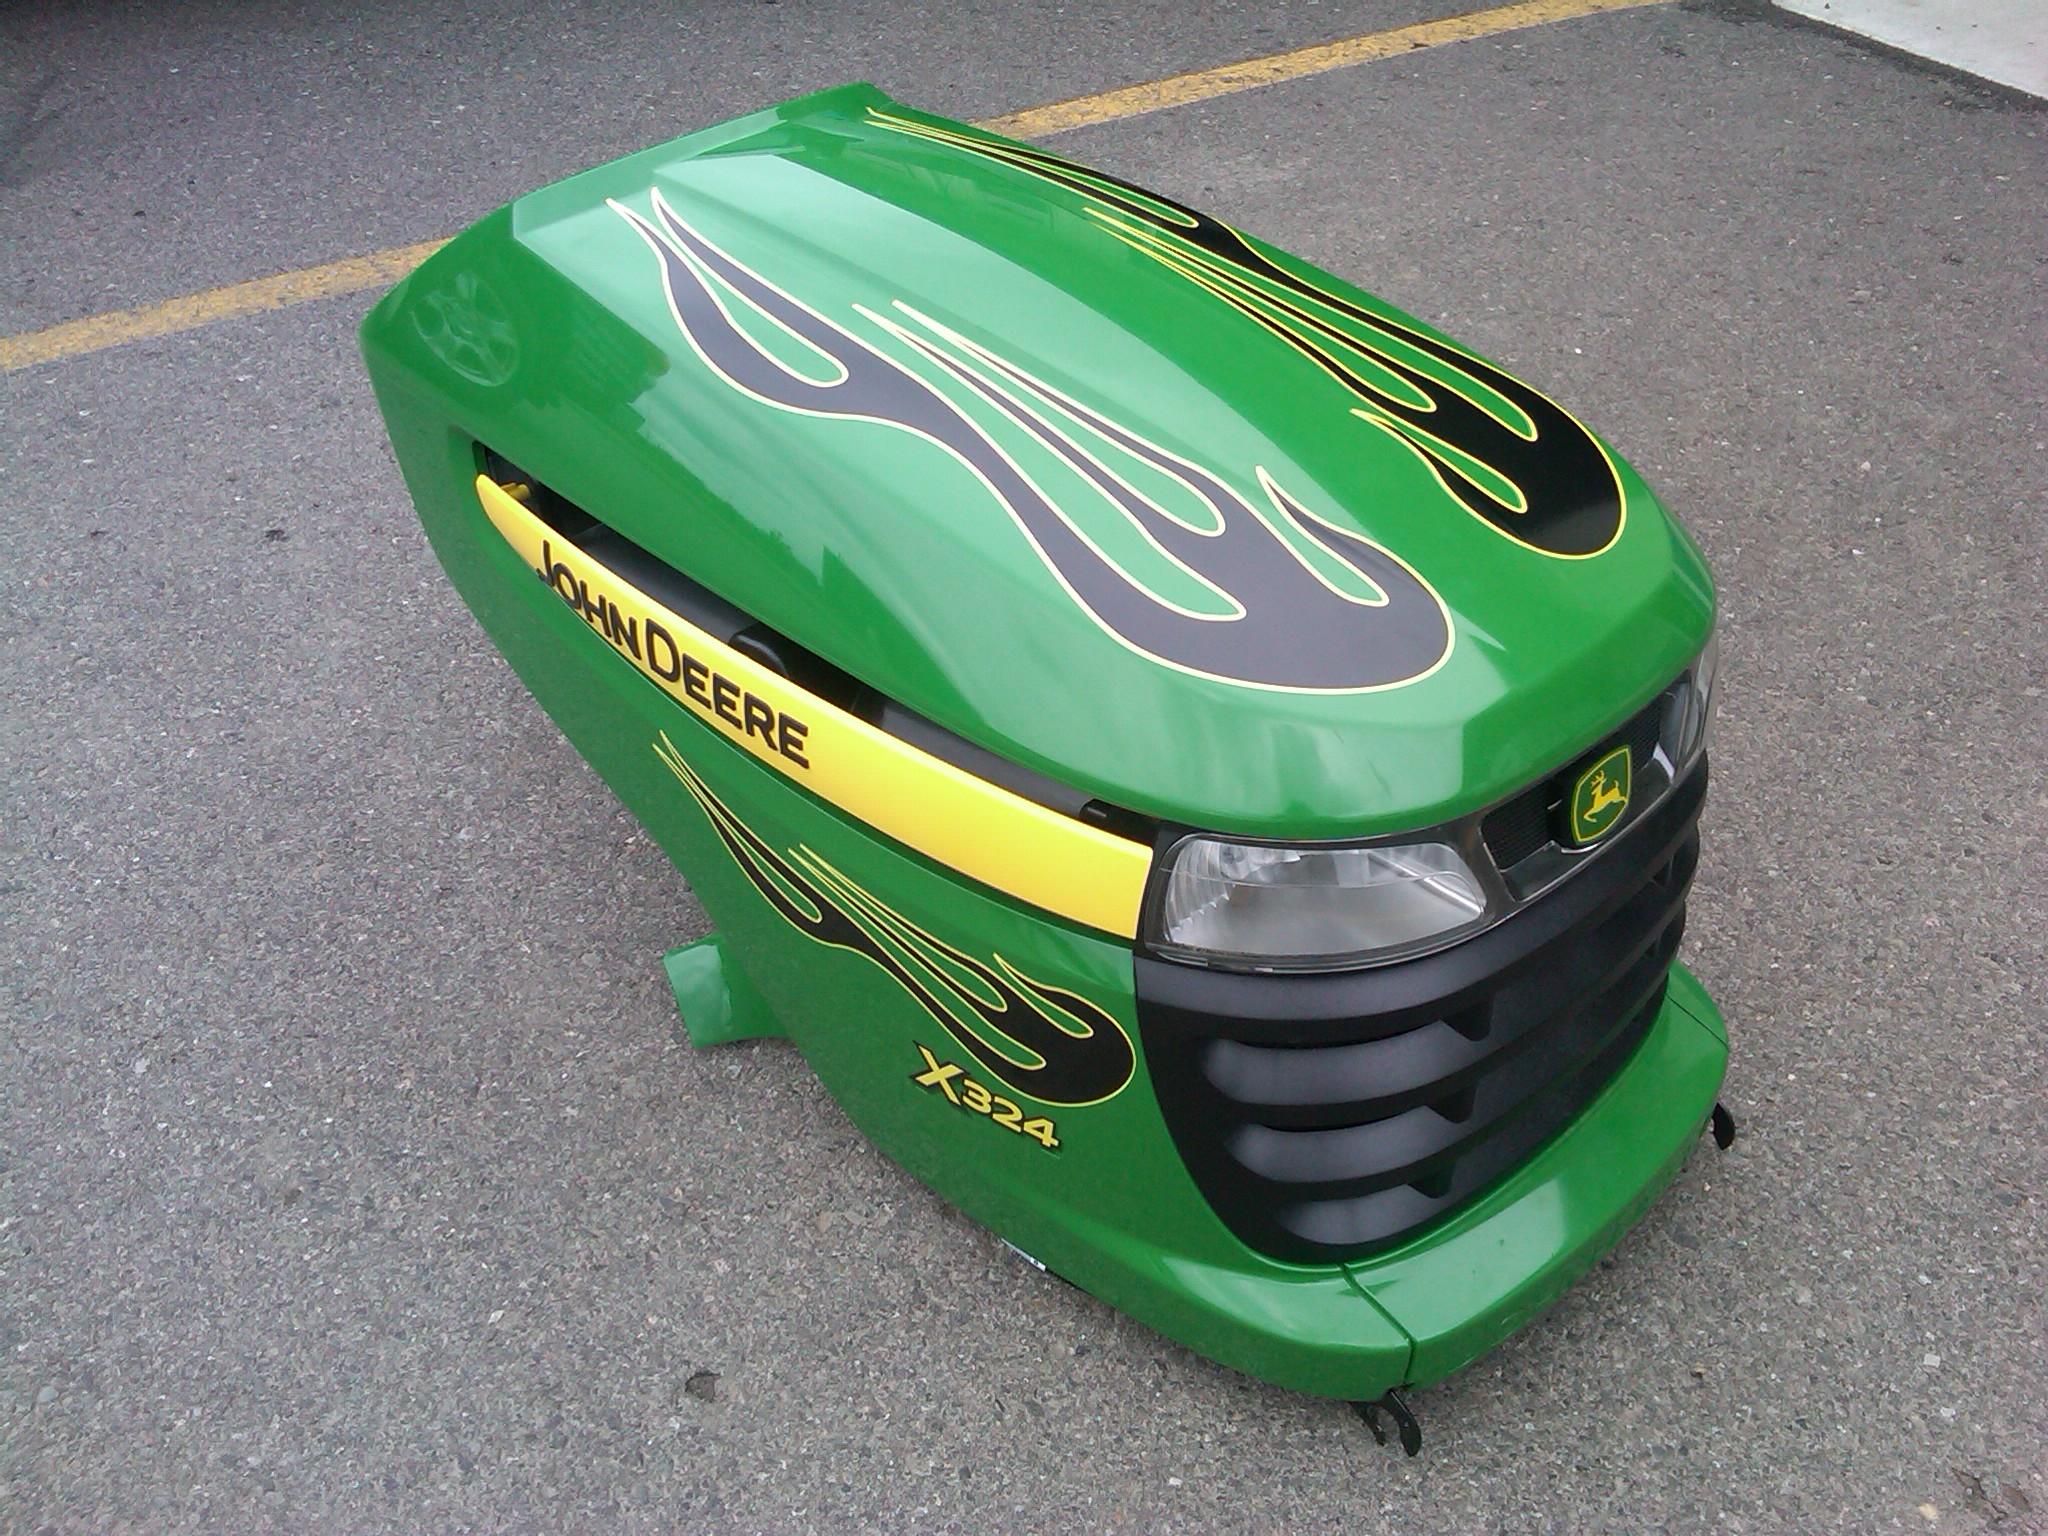 John Deere Mower Flames 183 Let S Wrap